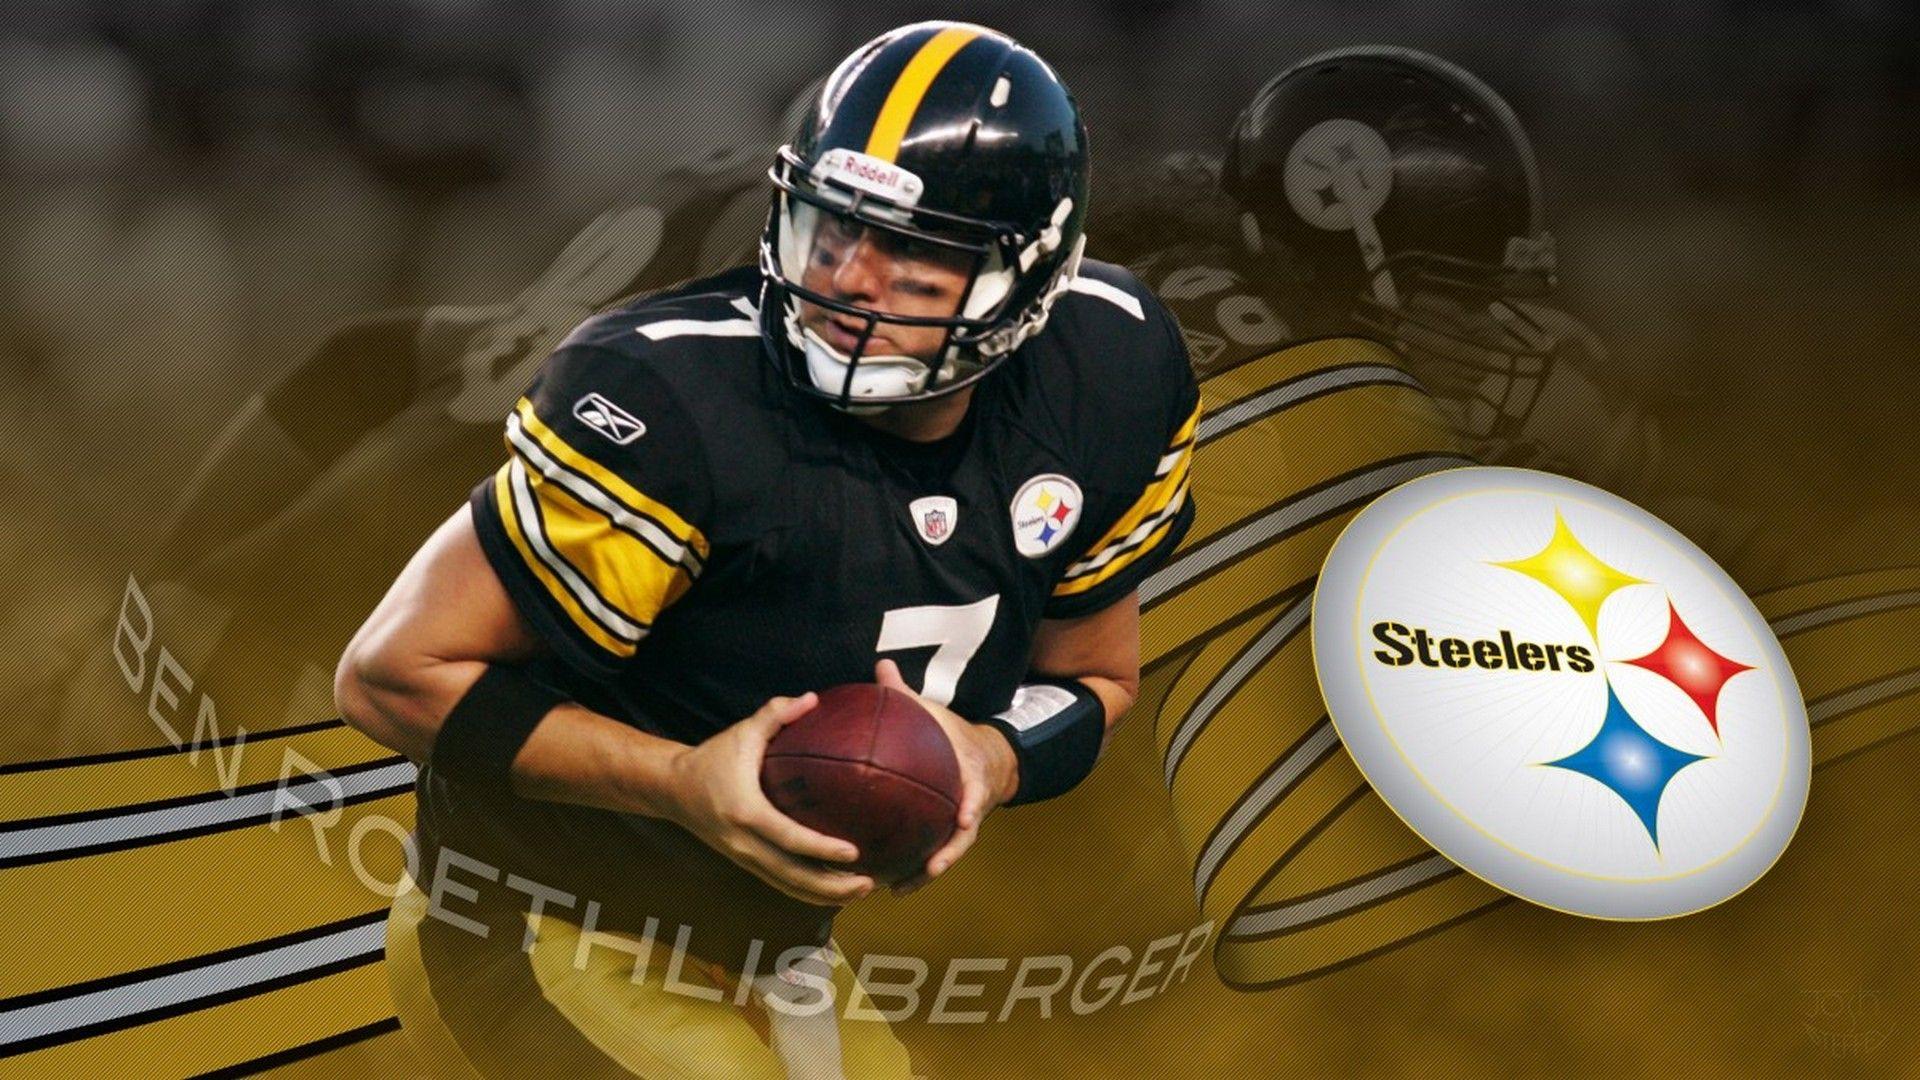 Wallpapers HD Pittsburgh Steelers Football Pittsburgh